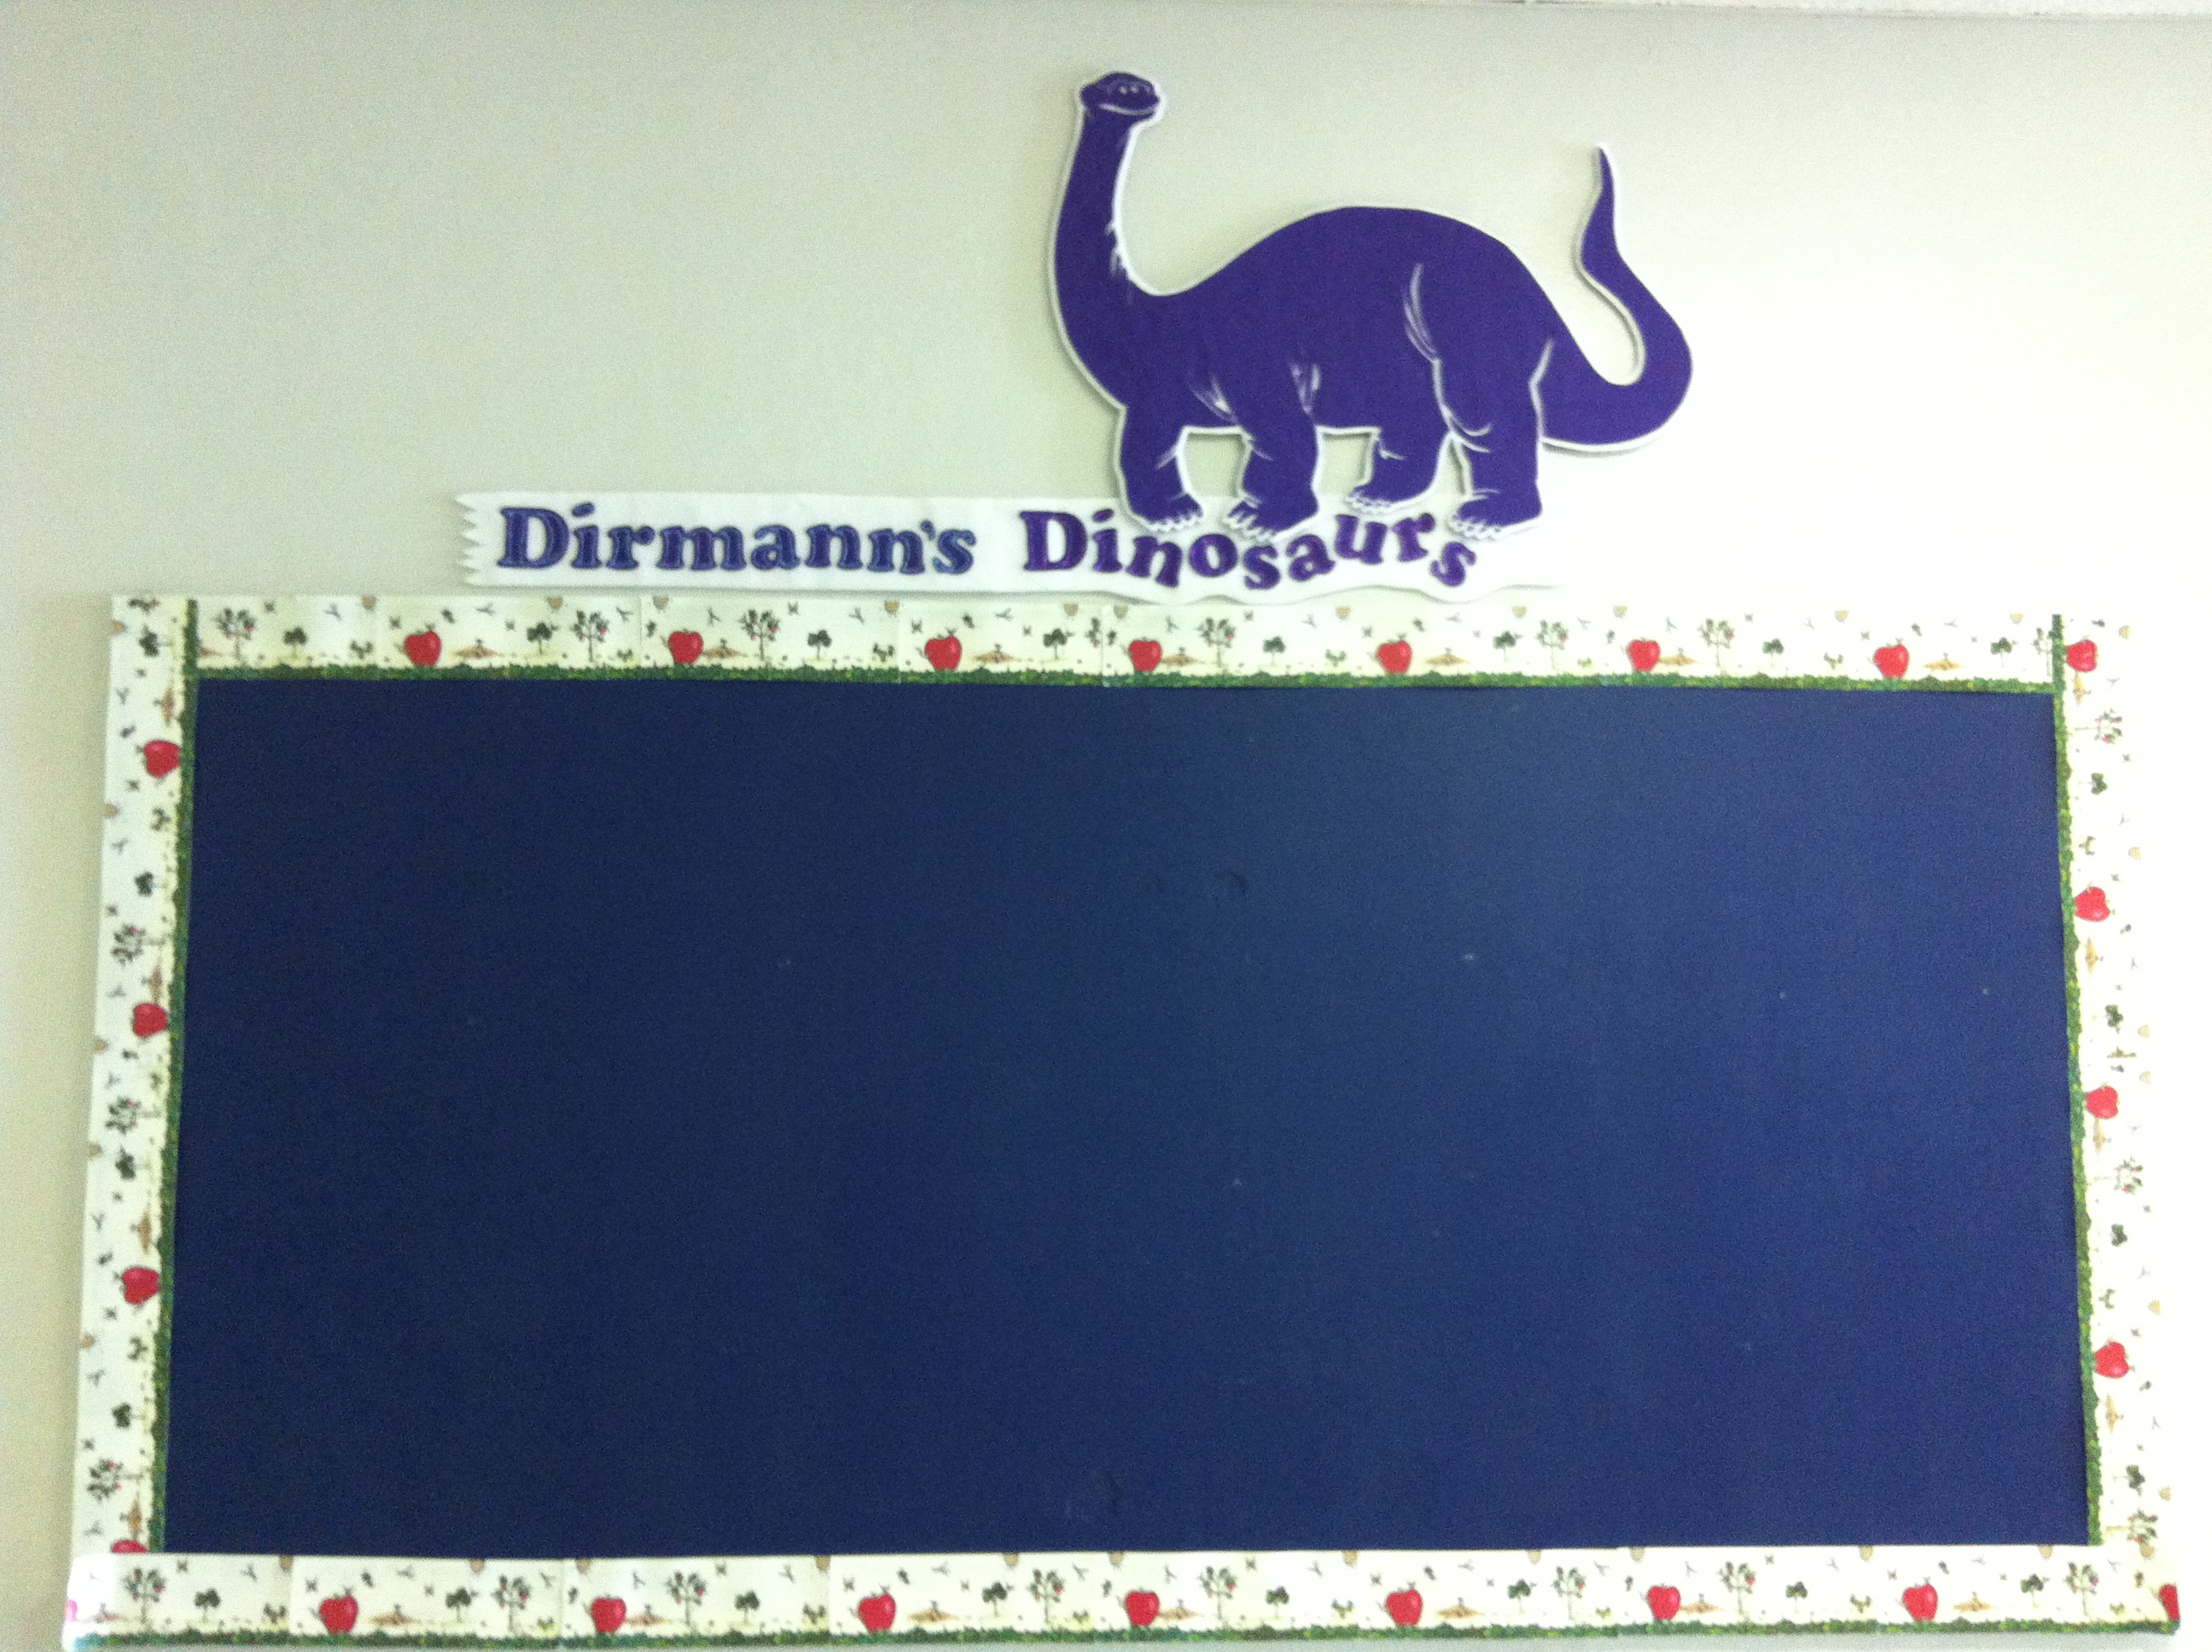 Dirmann's Dinosaurs